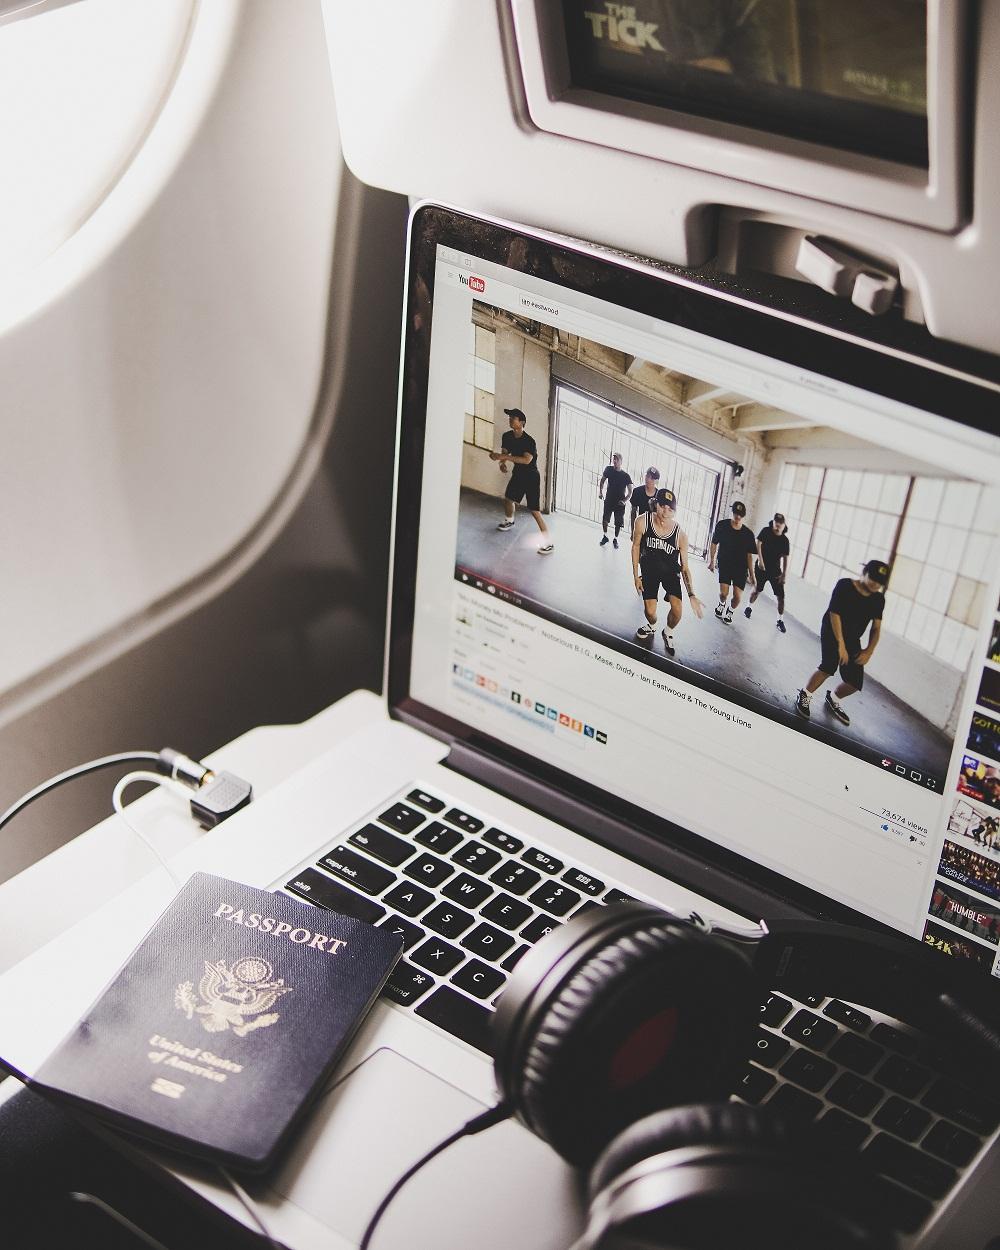 Video SEO: Increase Video Ranking on YouTube